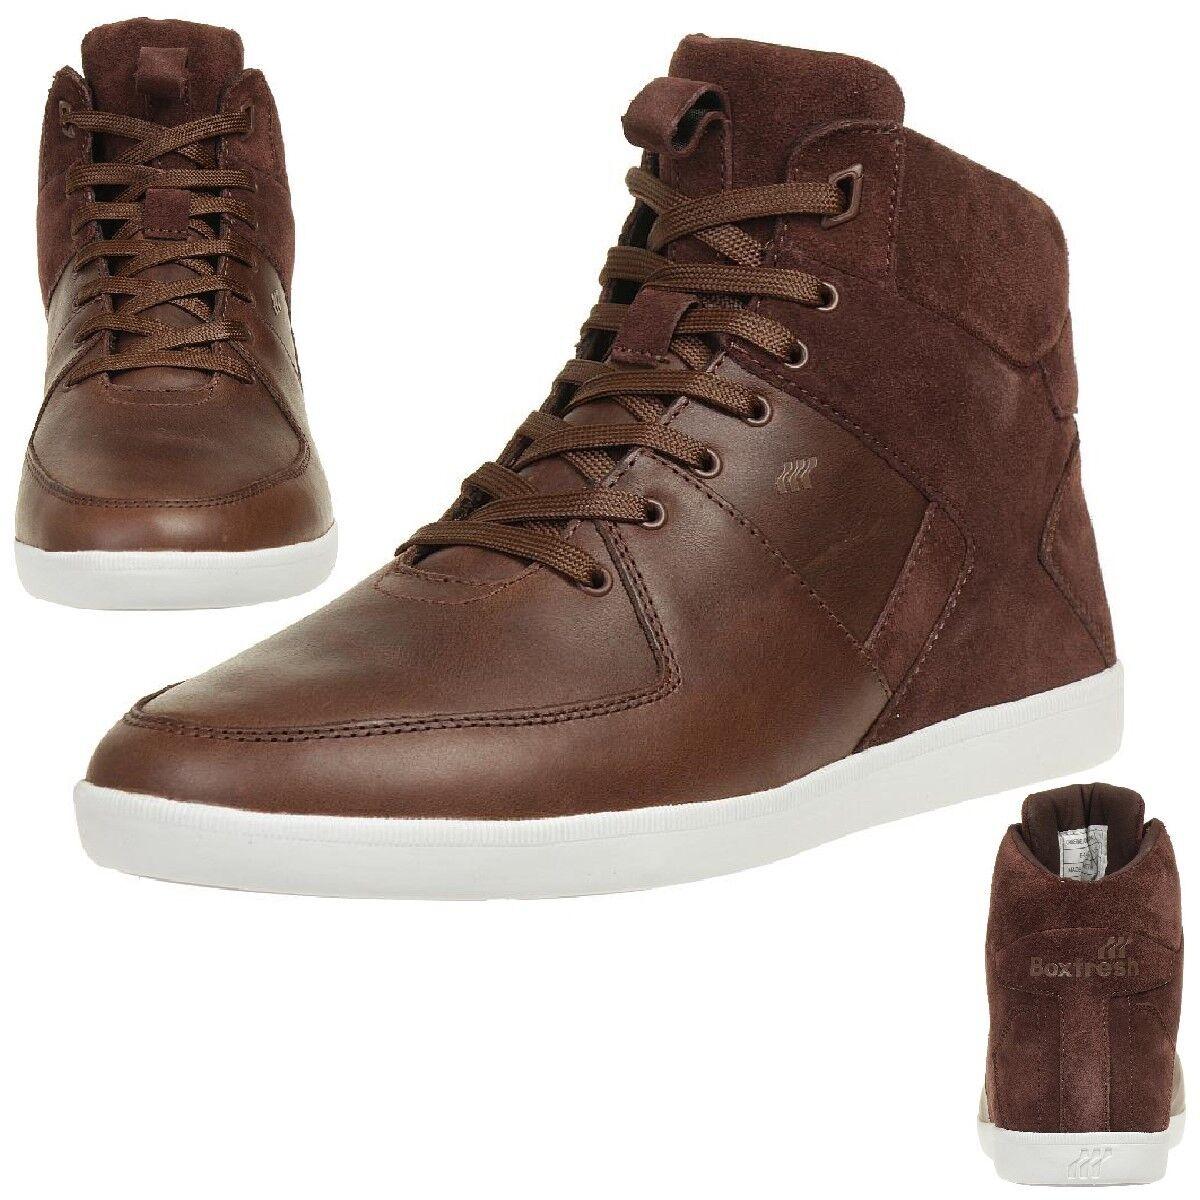 Boxfresh Camberwell CIE Lea SDE zapatillas zapatos de hombre de cuero E14776